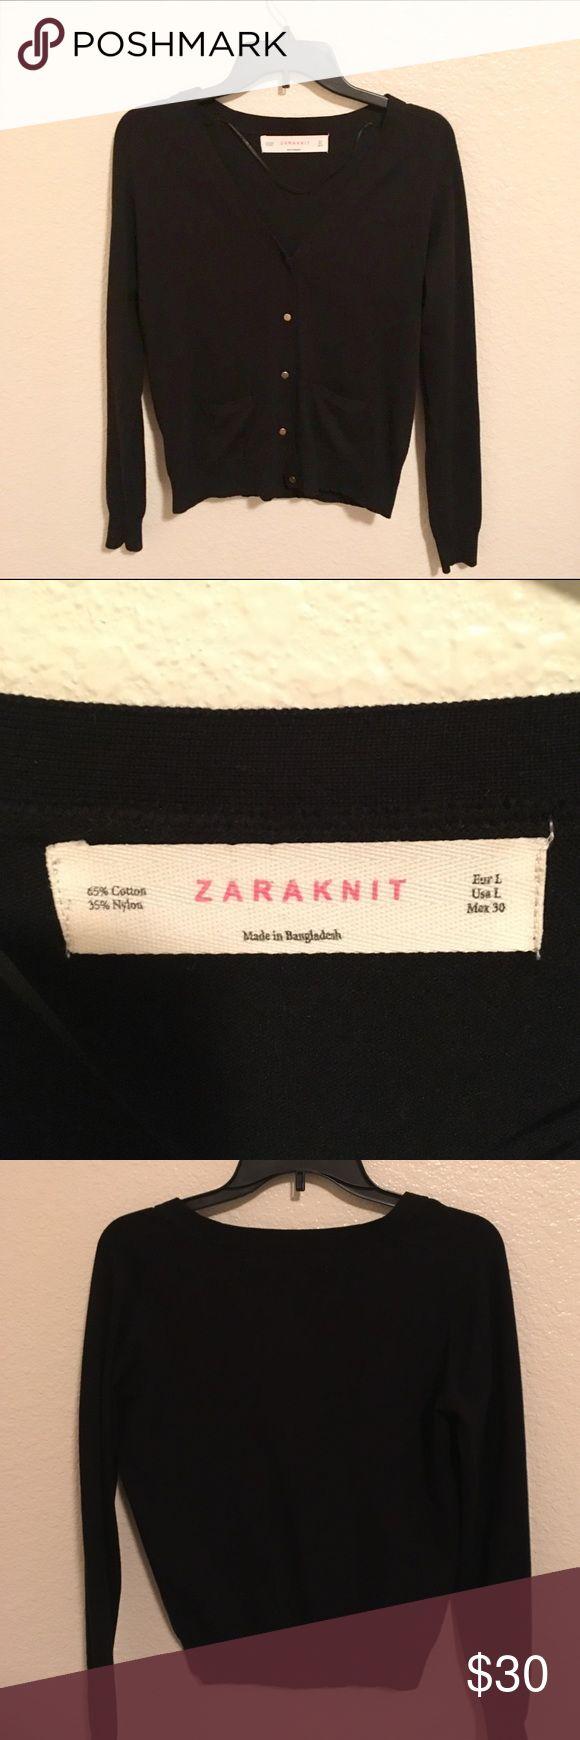 NWOT ZARA knit cardigan NWOT. Black knit ZARA cardigan! Perfect condition. Smoke free and pet free home Zara Tops